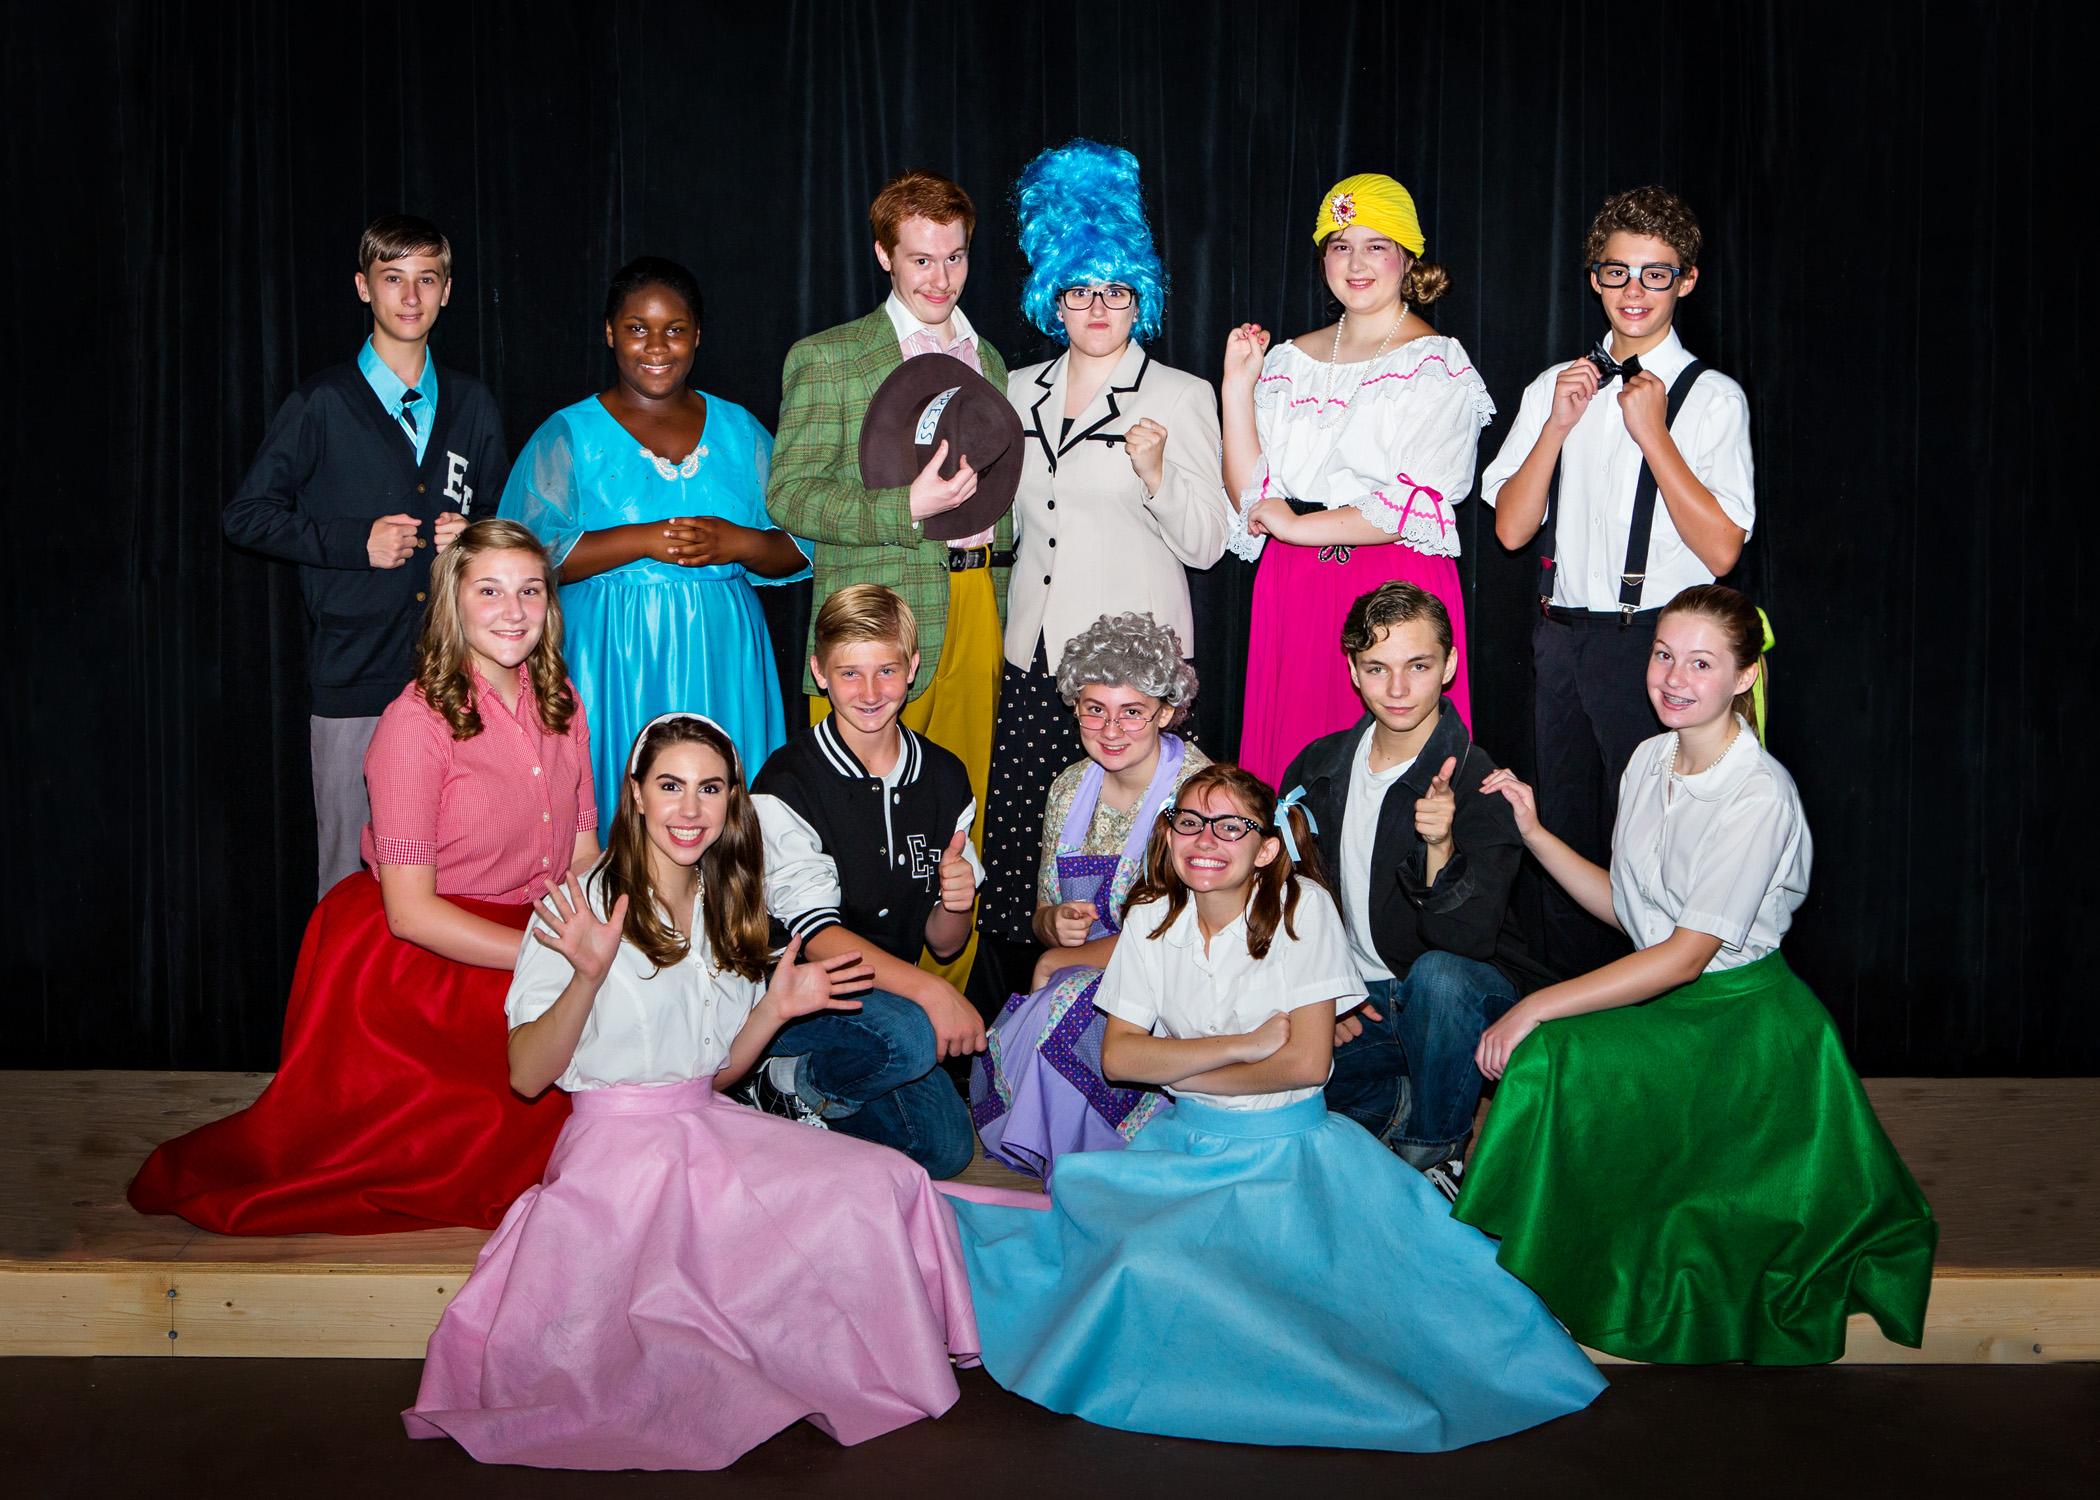 Rockwall Community Playhouse presents Zombie Prom